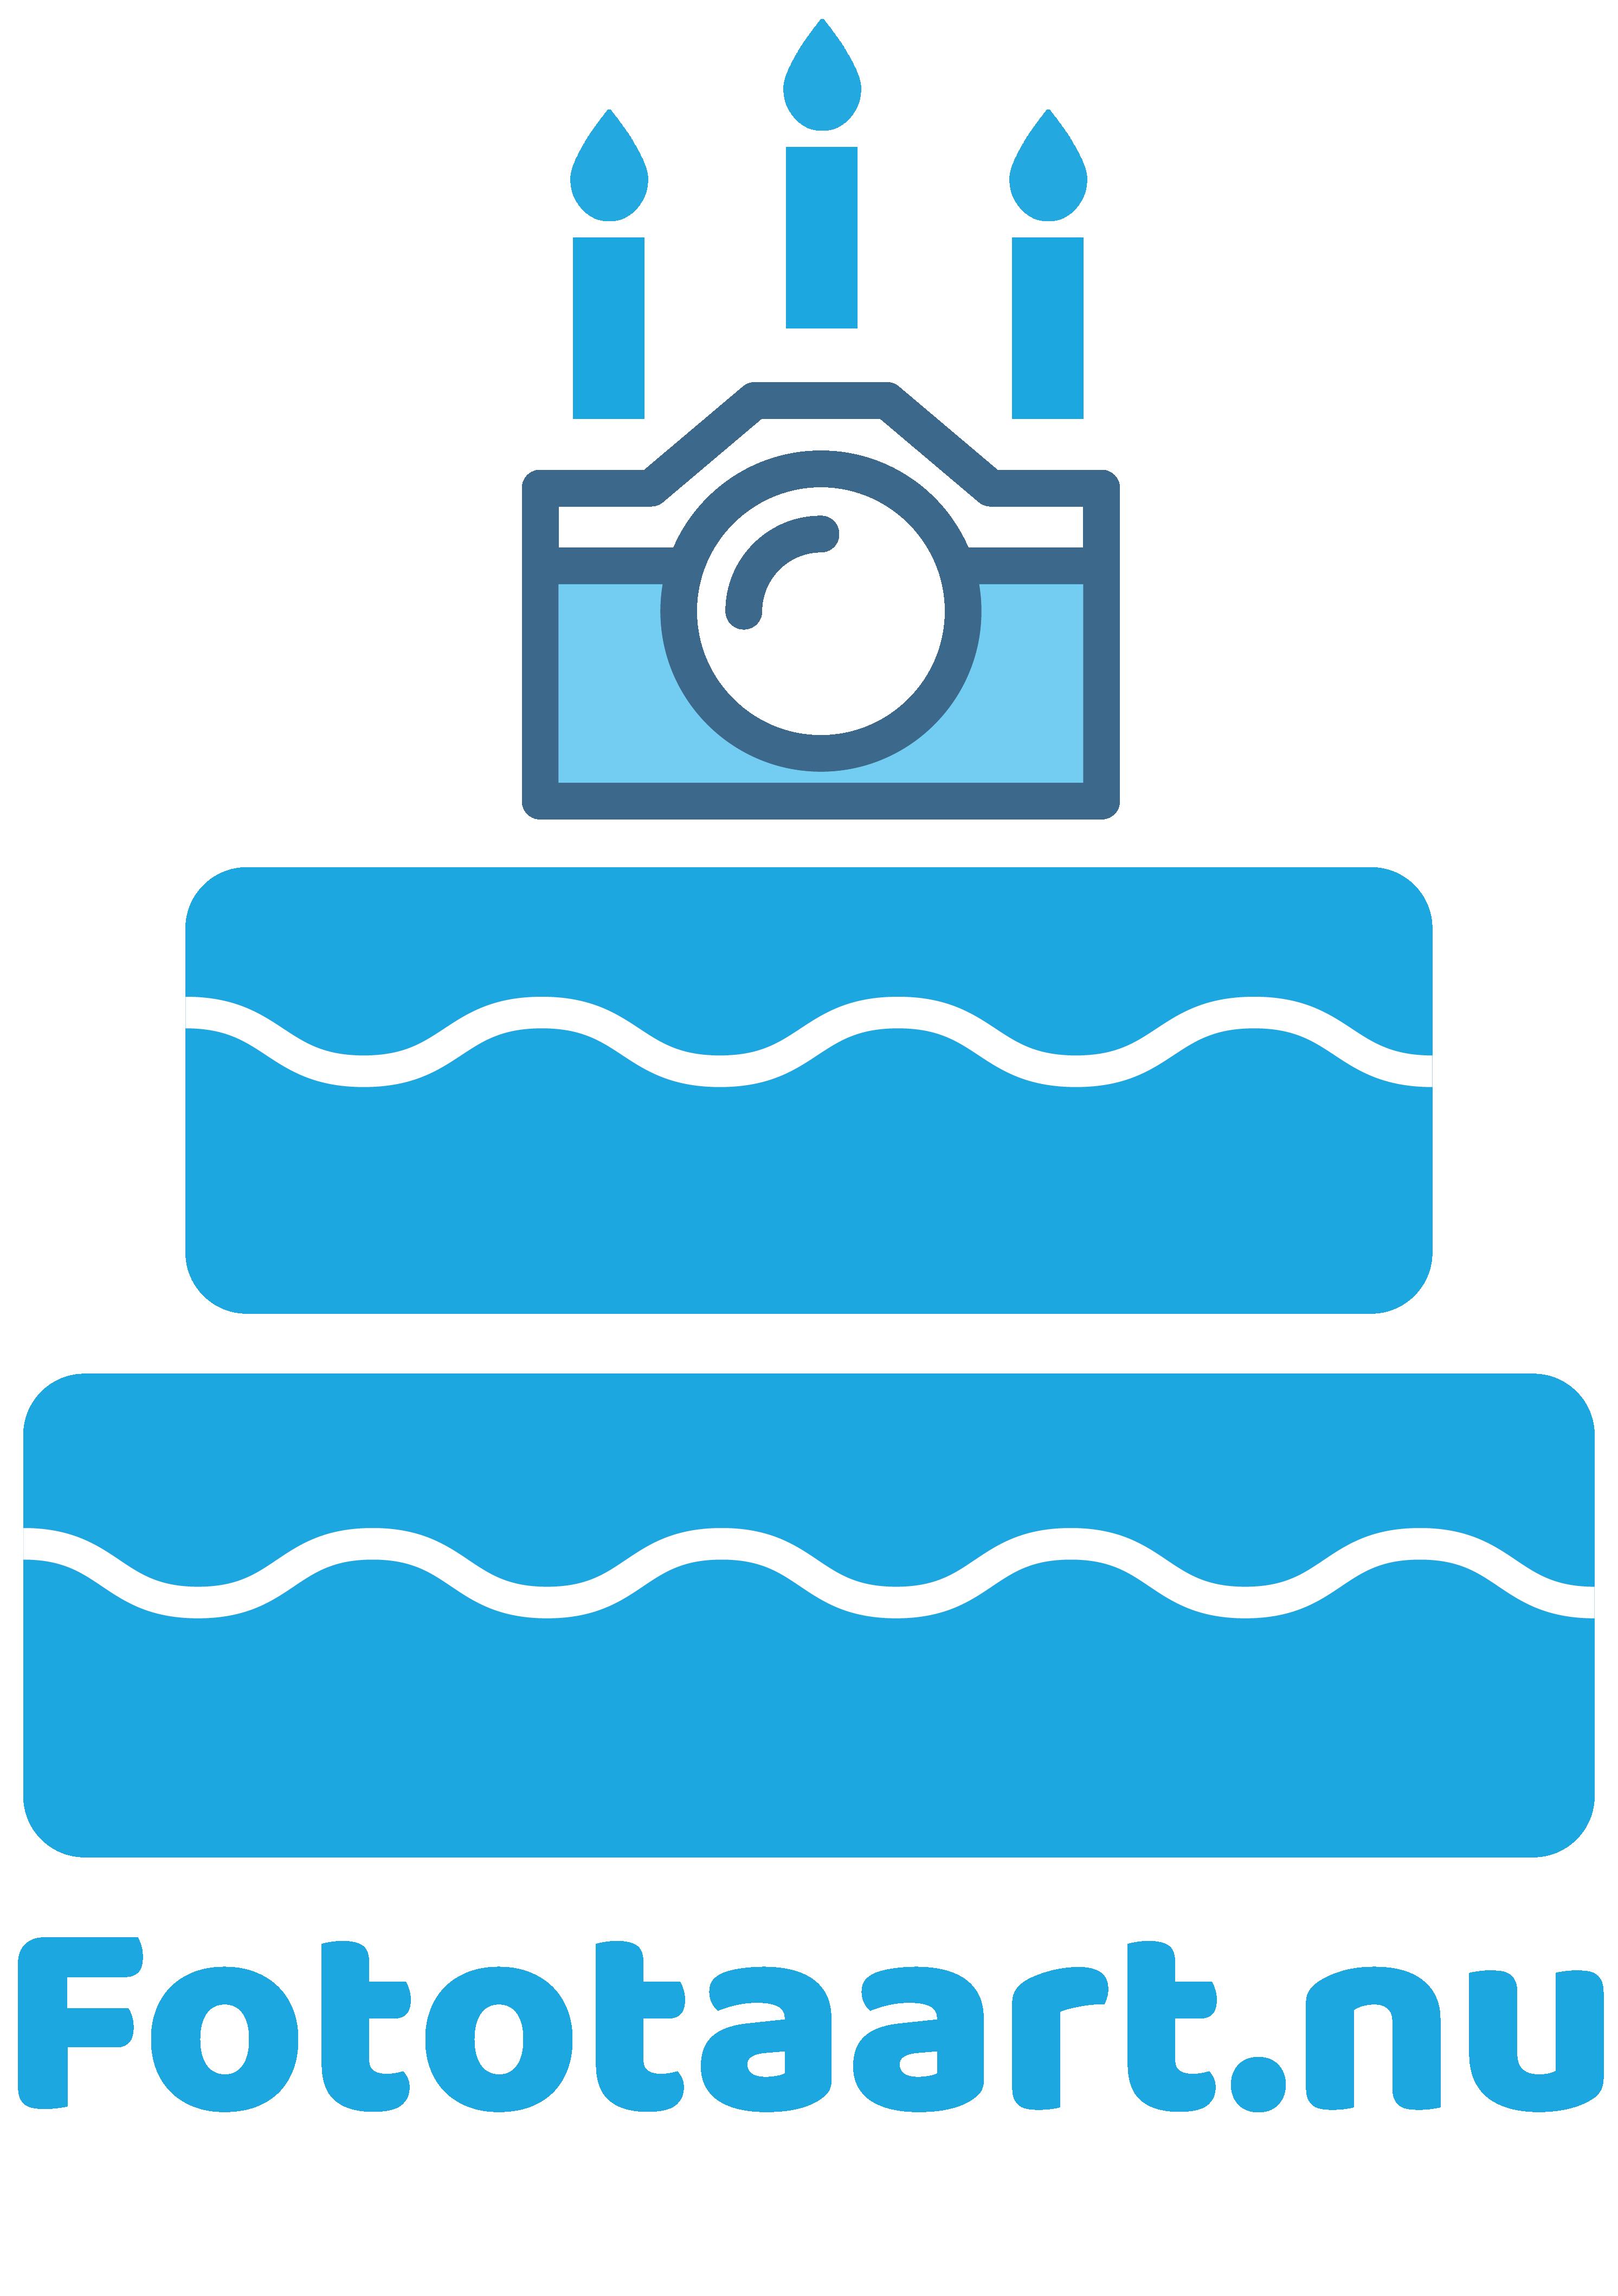 Fototaart.nu Logo